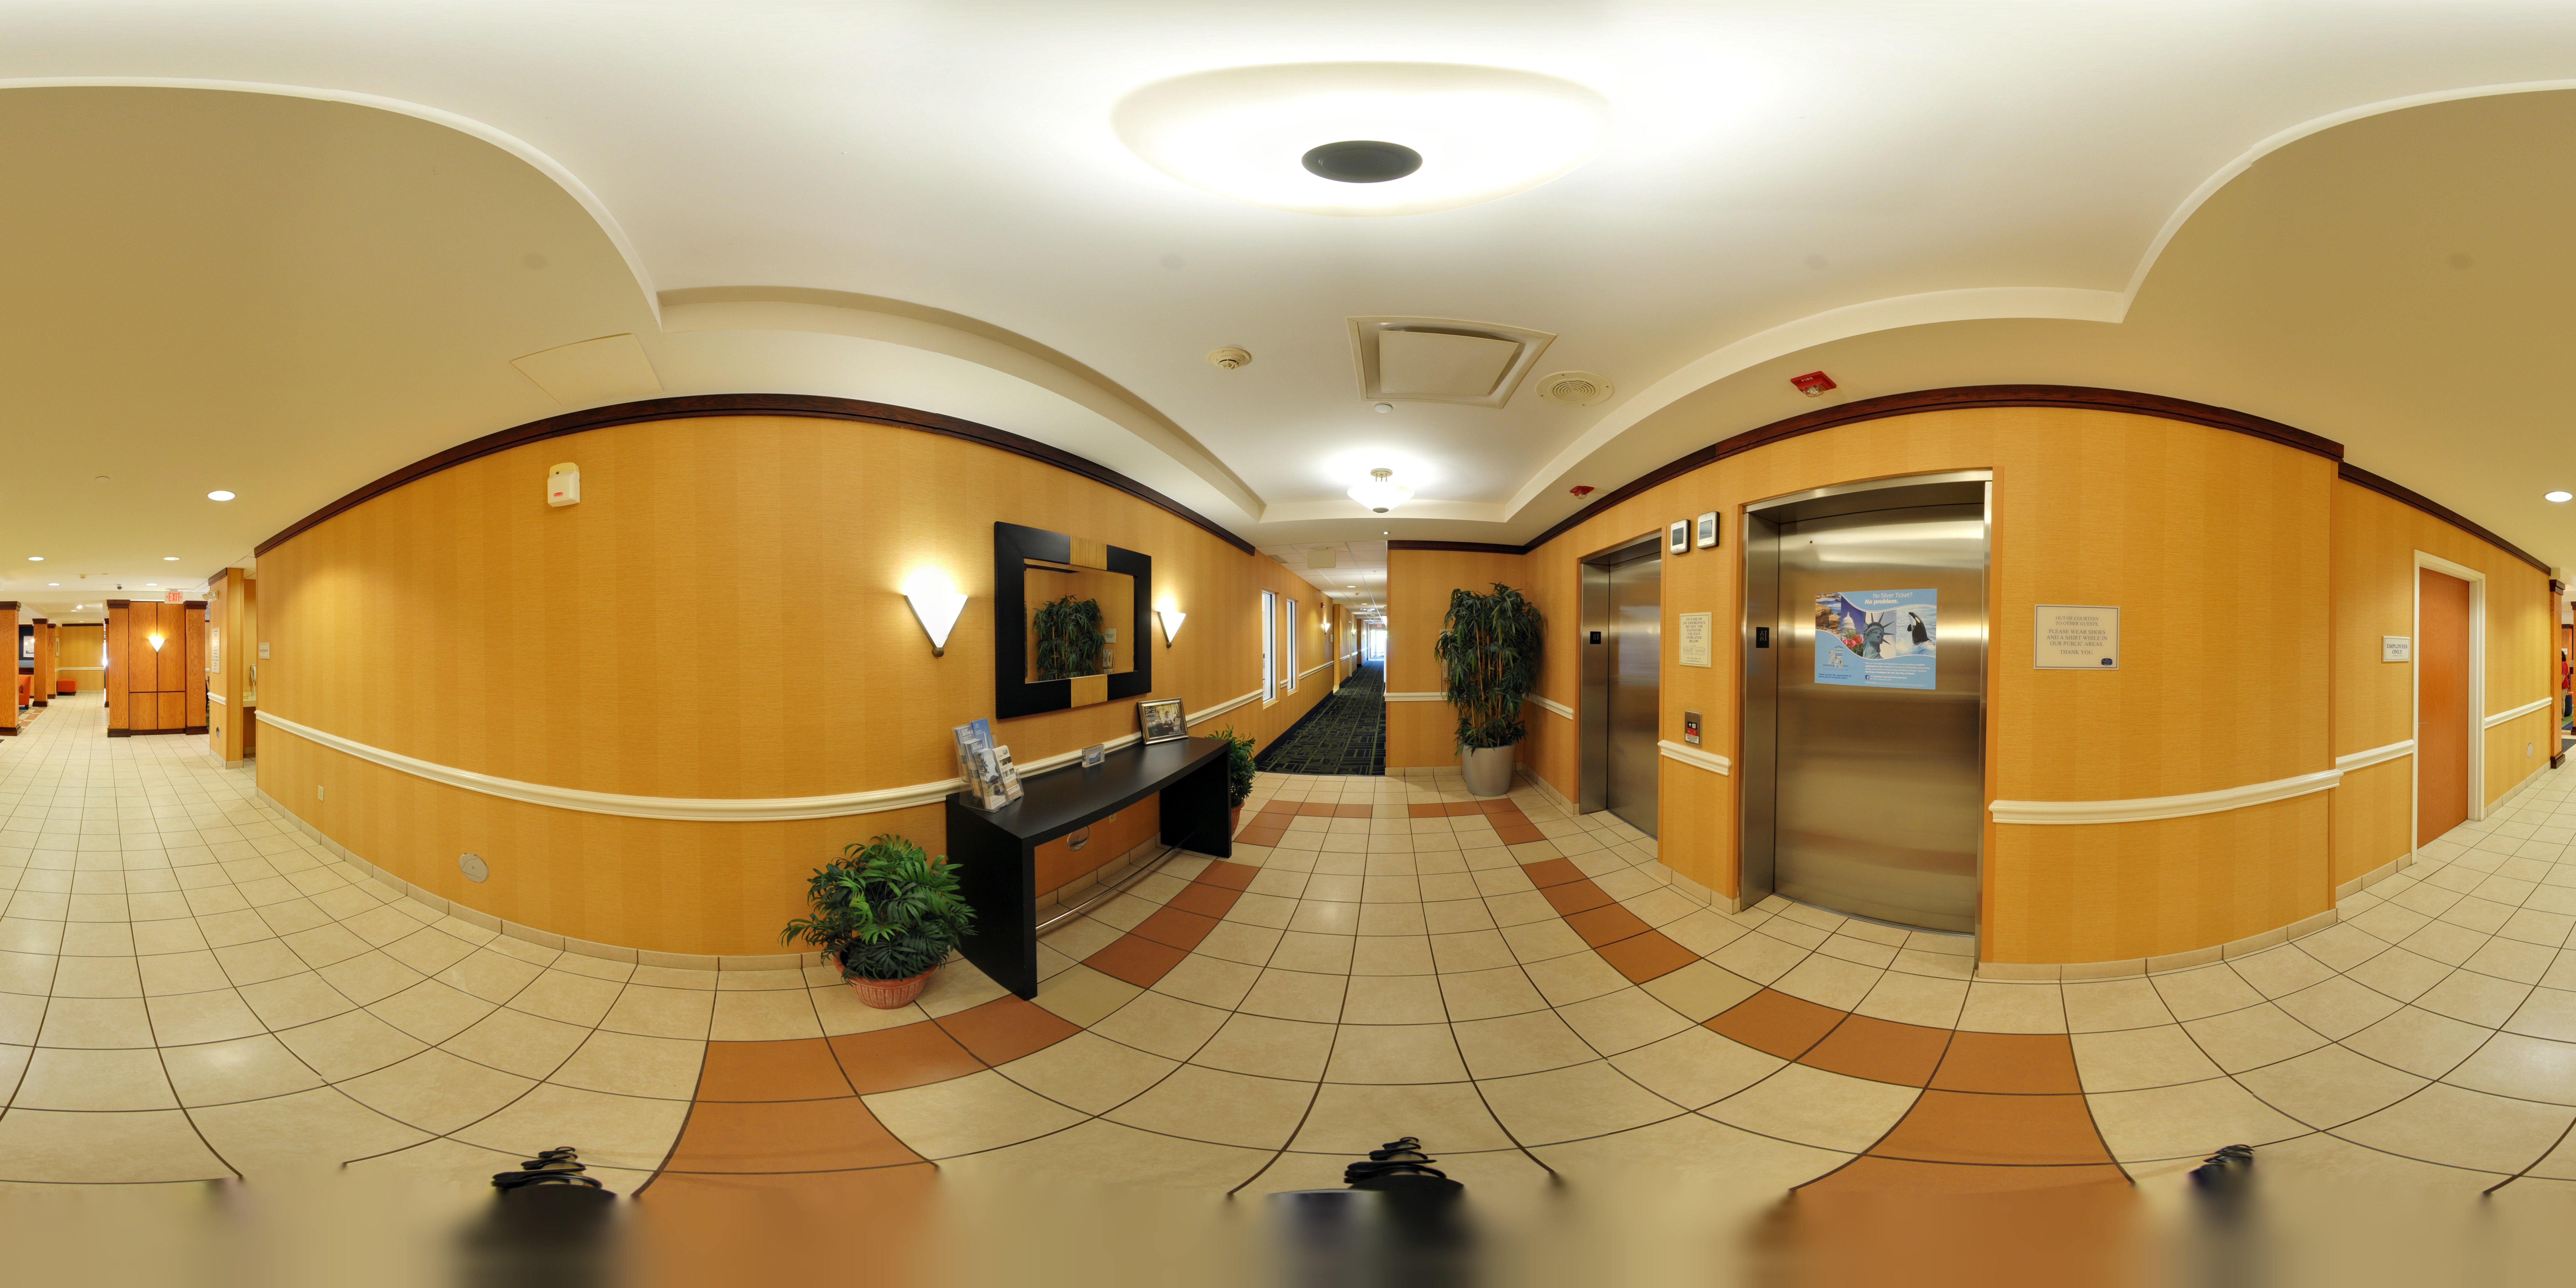 Fairfield Inn & Suites by Marriott Akron South image 42